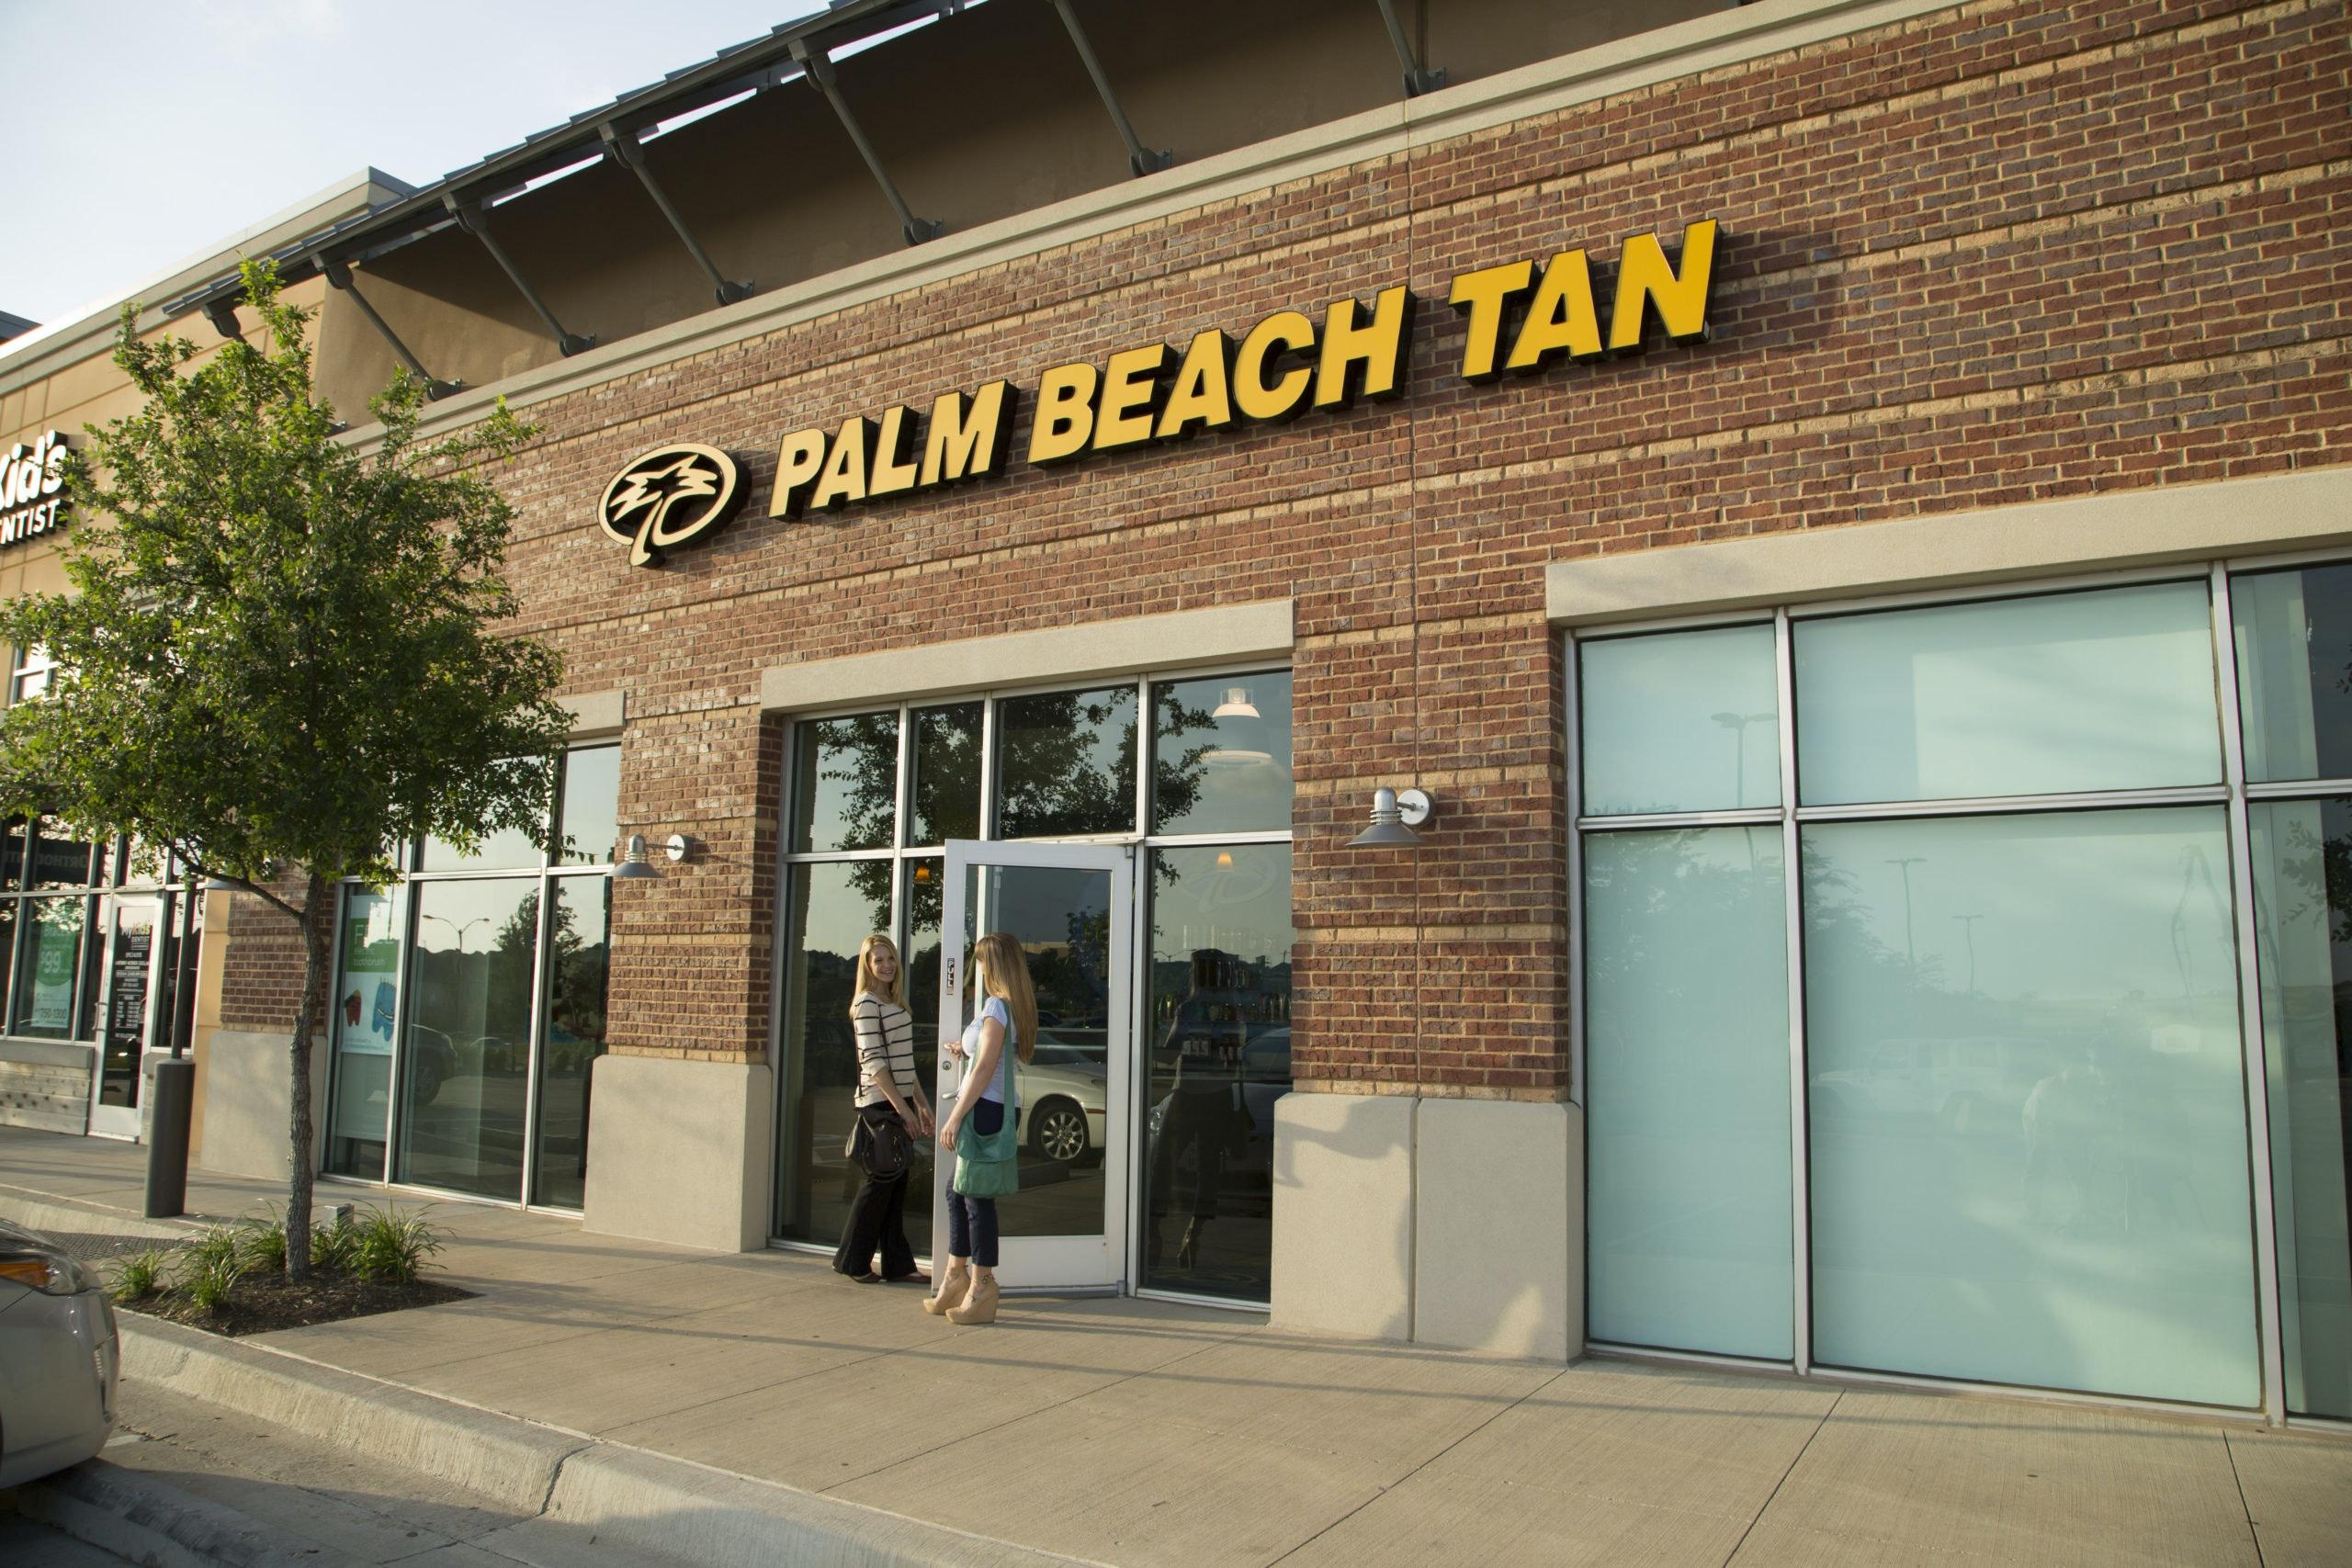 Exterior of a Palm Beach Tan location